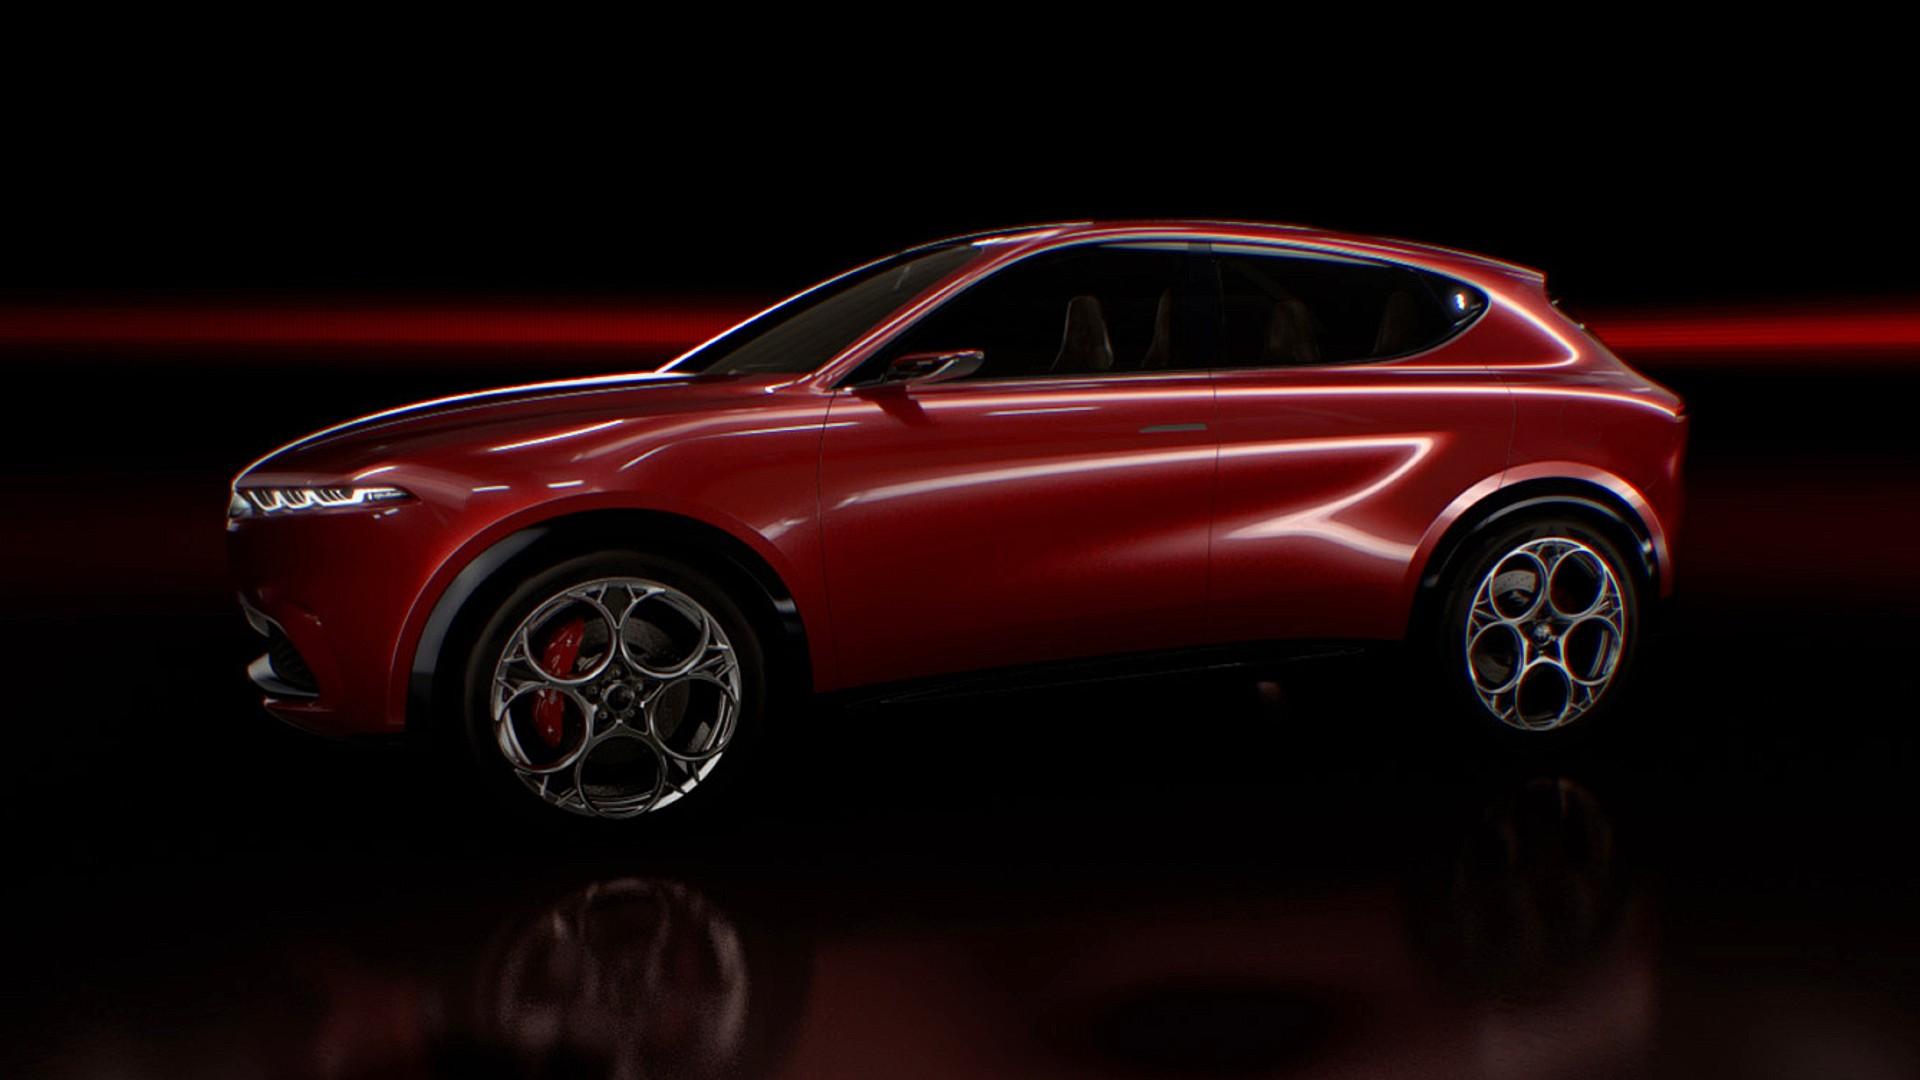 Alfa Romeo: Καθυστερεί το λανσάρισμα της Tonale γιατί θέλει… βελτίωση!